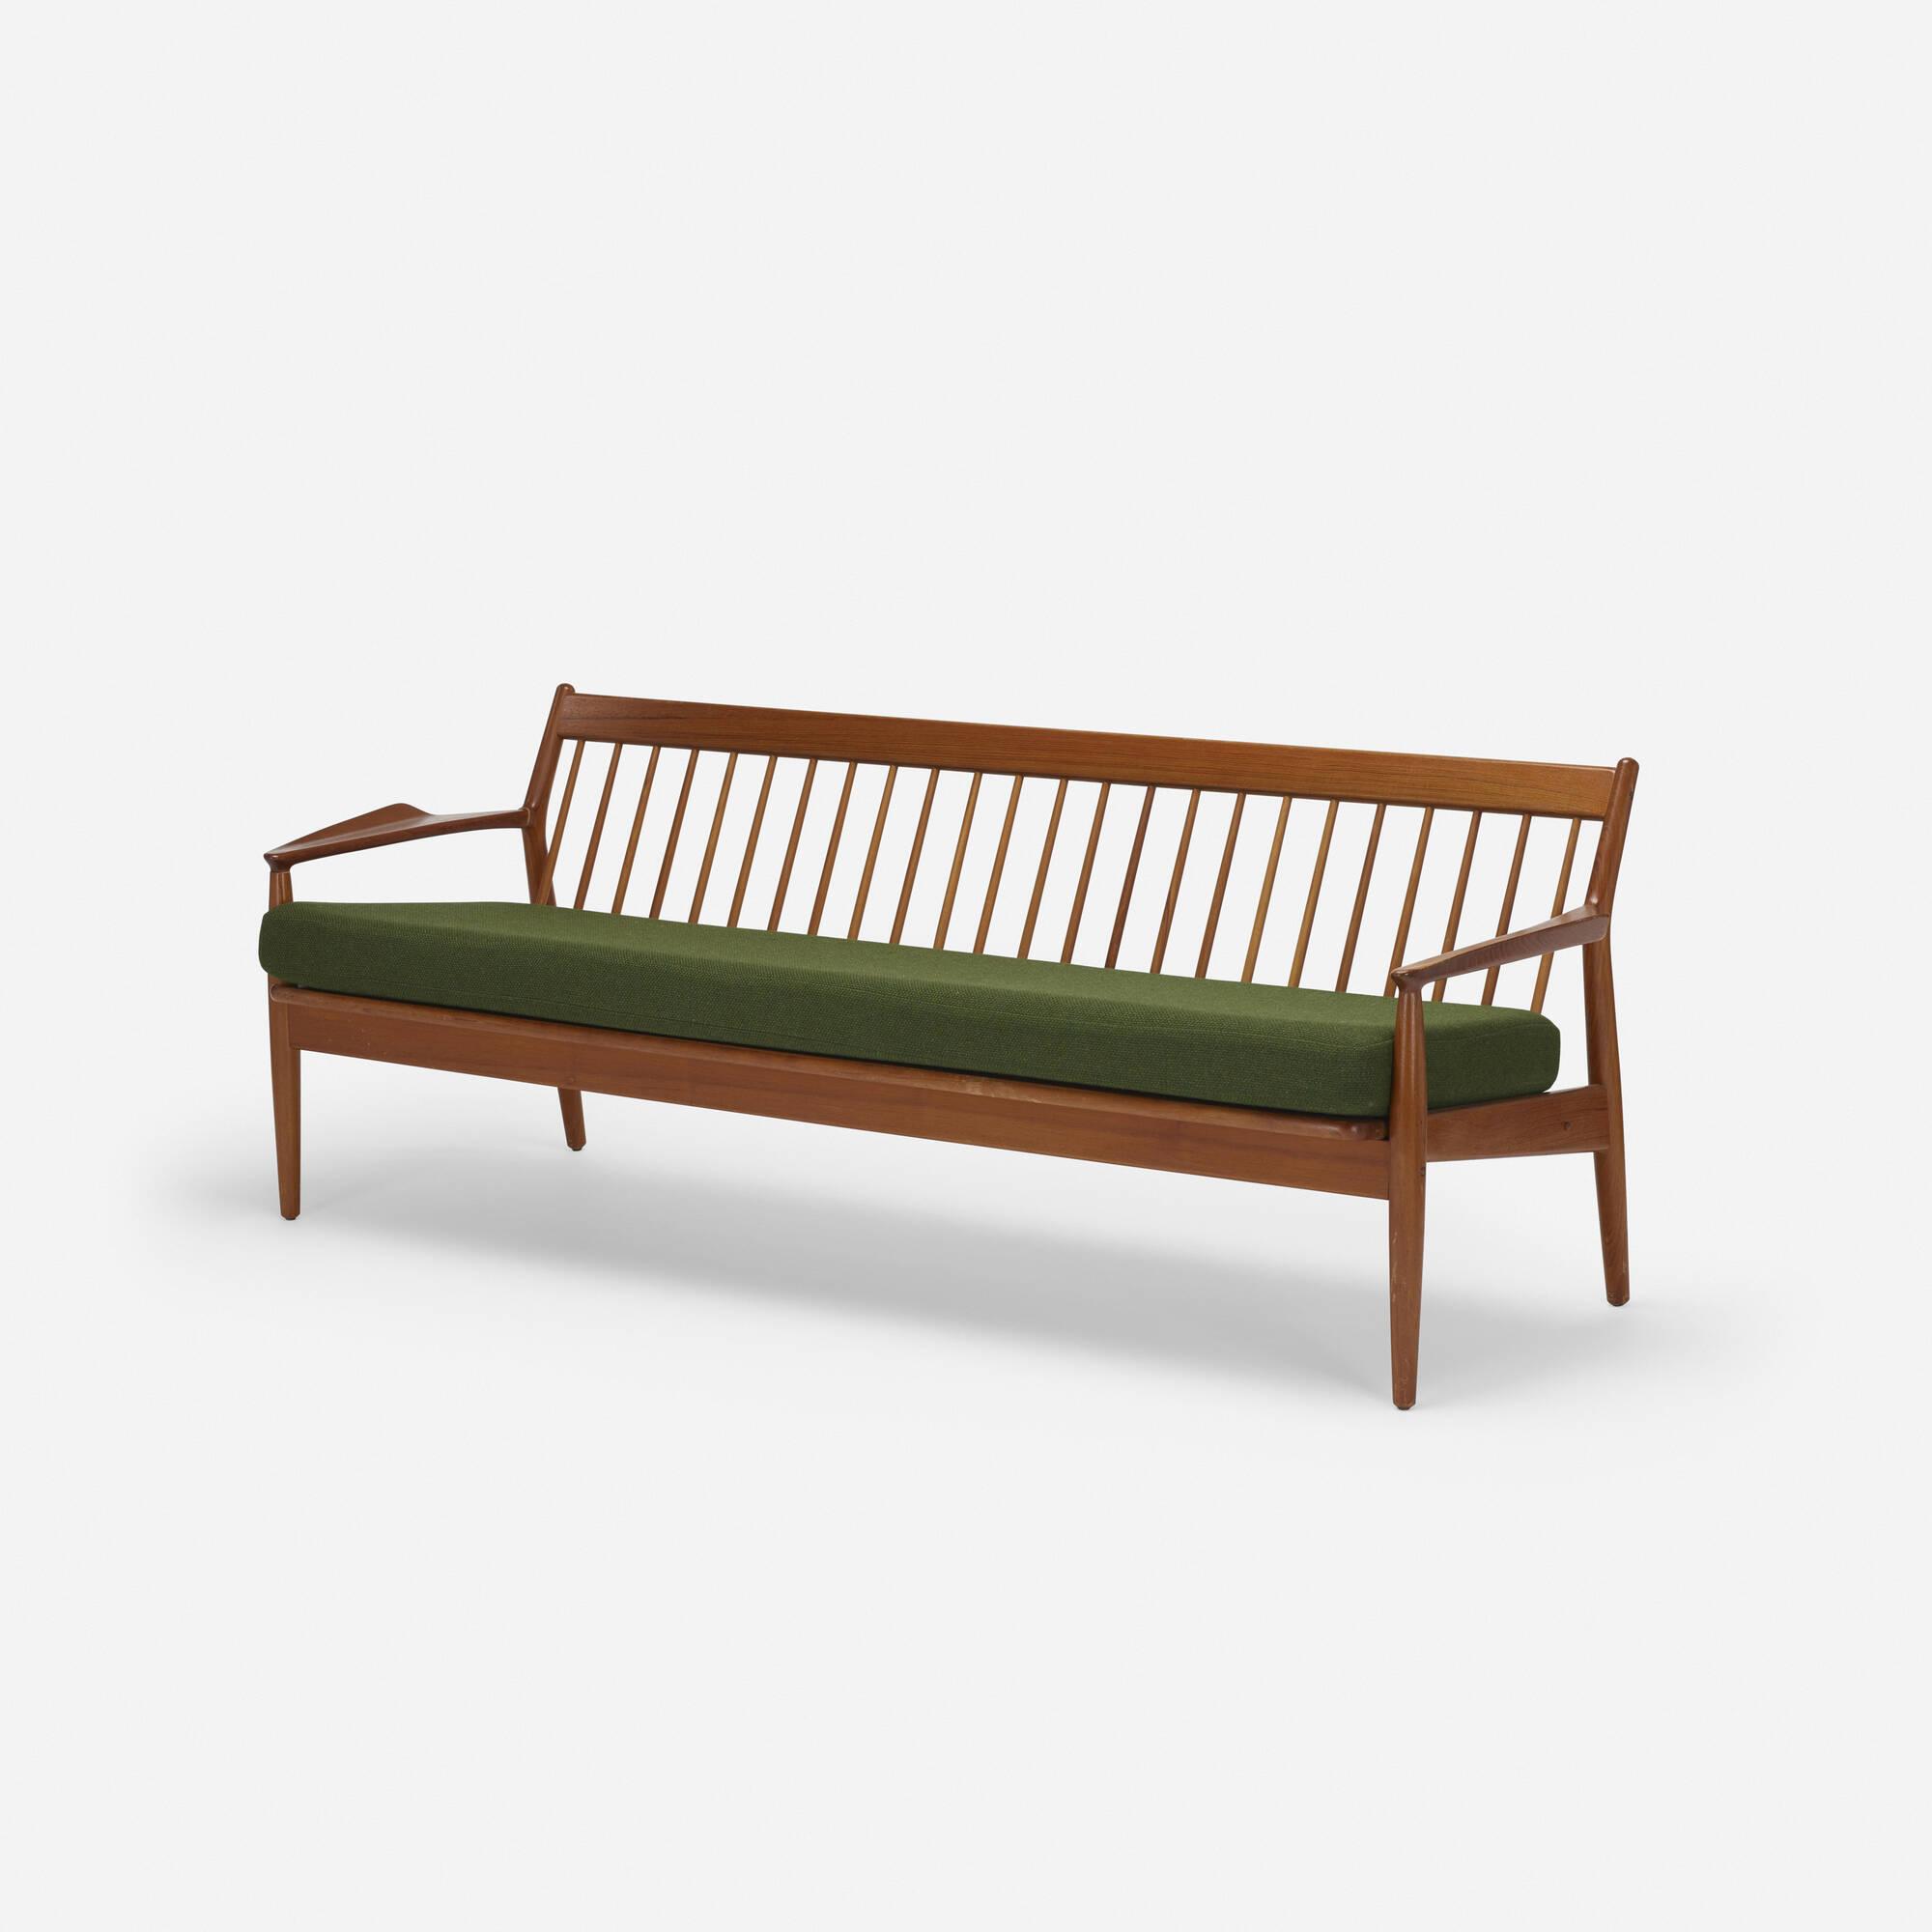 777: Arne Vodder / sofa (1 of 3)